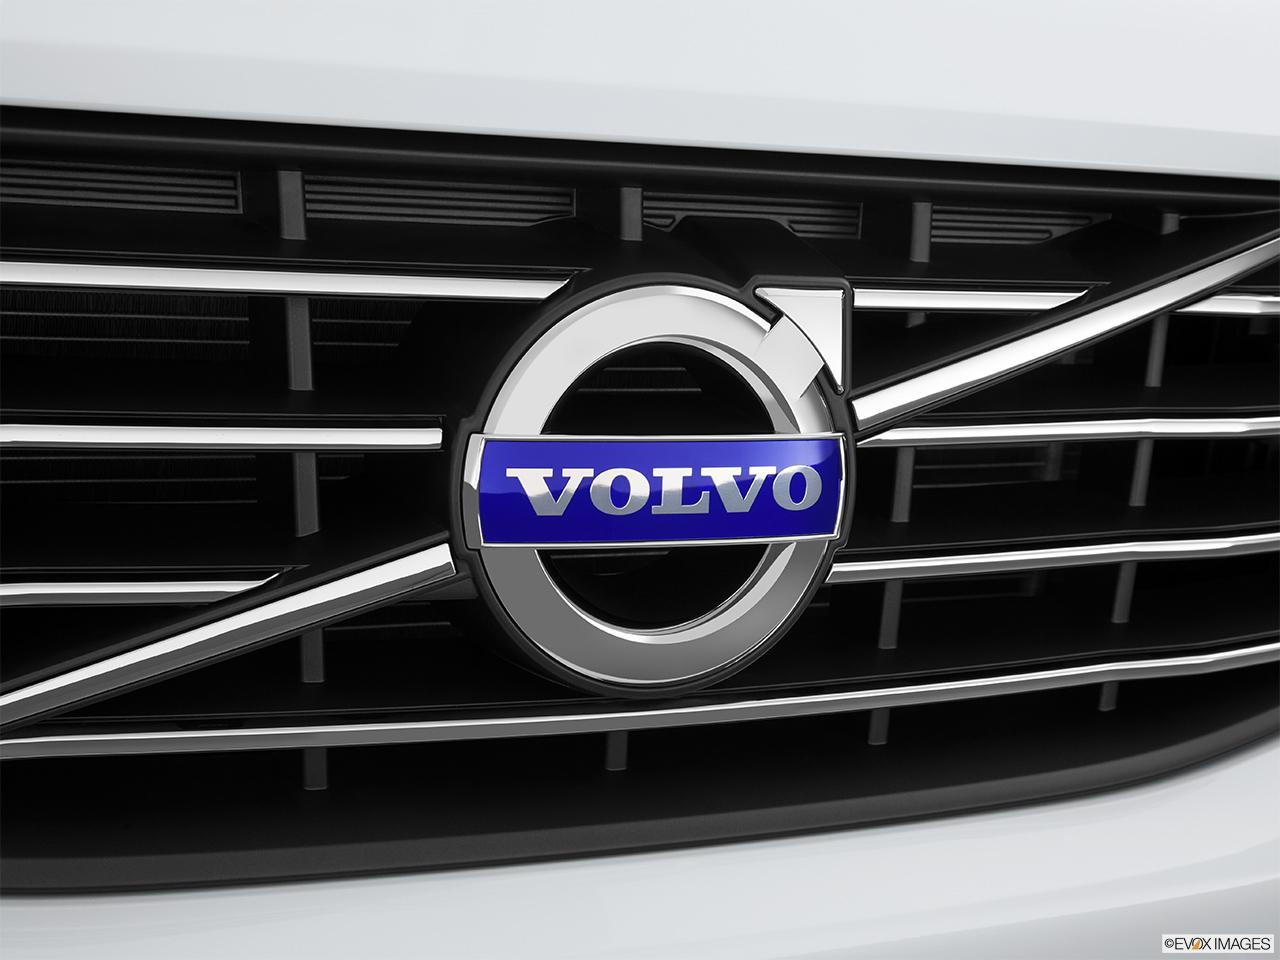 volvo logo 2015. 2015 volvo xc60 awd 4 door t6 rear manufacture badgeemblem logo